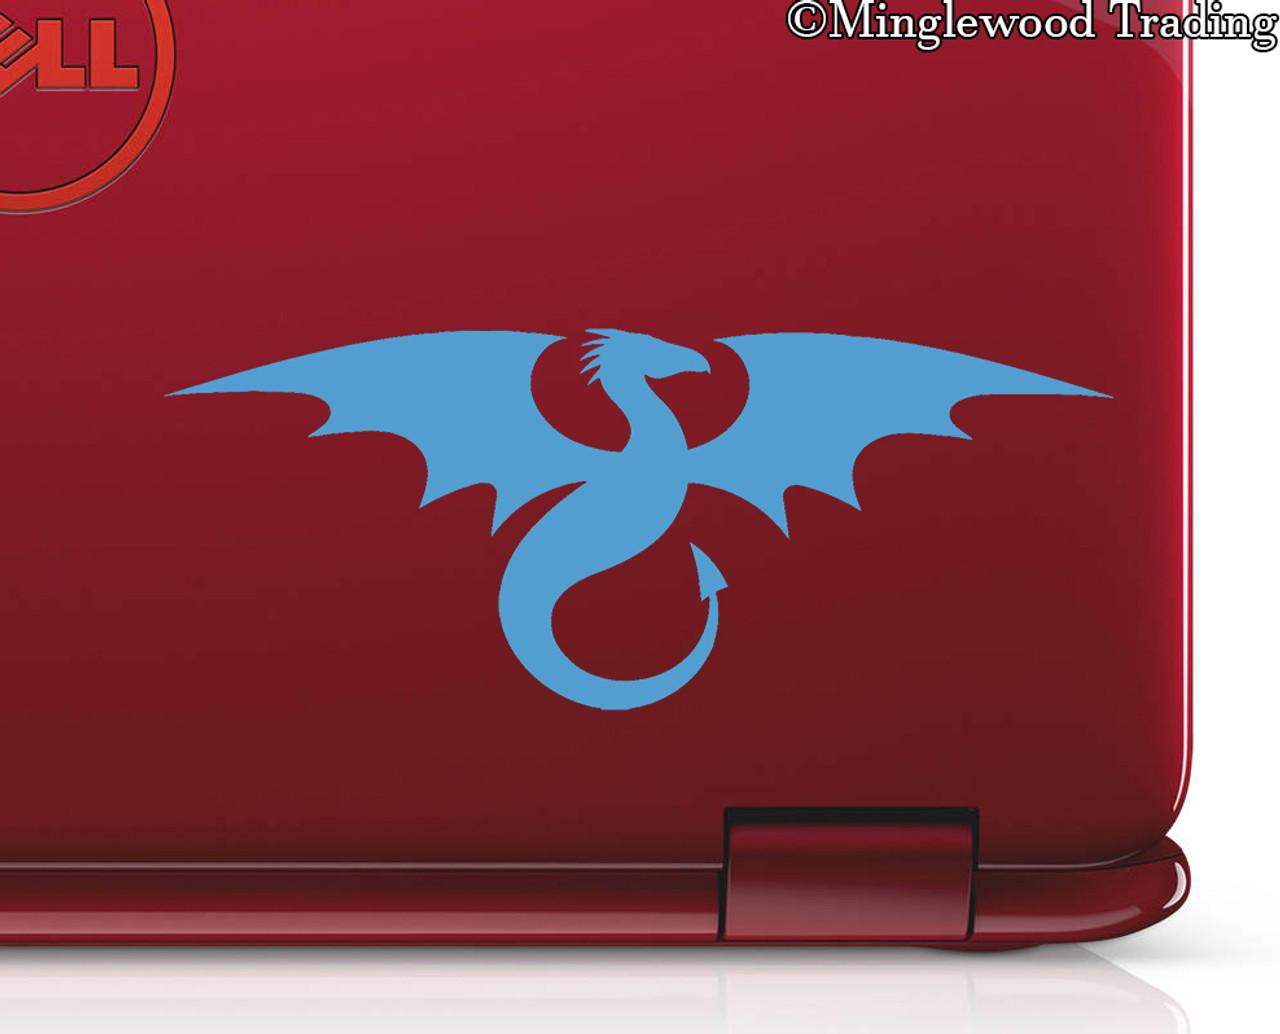 FLYING DRAGON Vinyl Decal Sticker -V3- Wyvern Medieval Fantasy Gaming